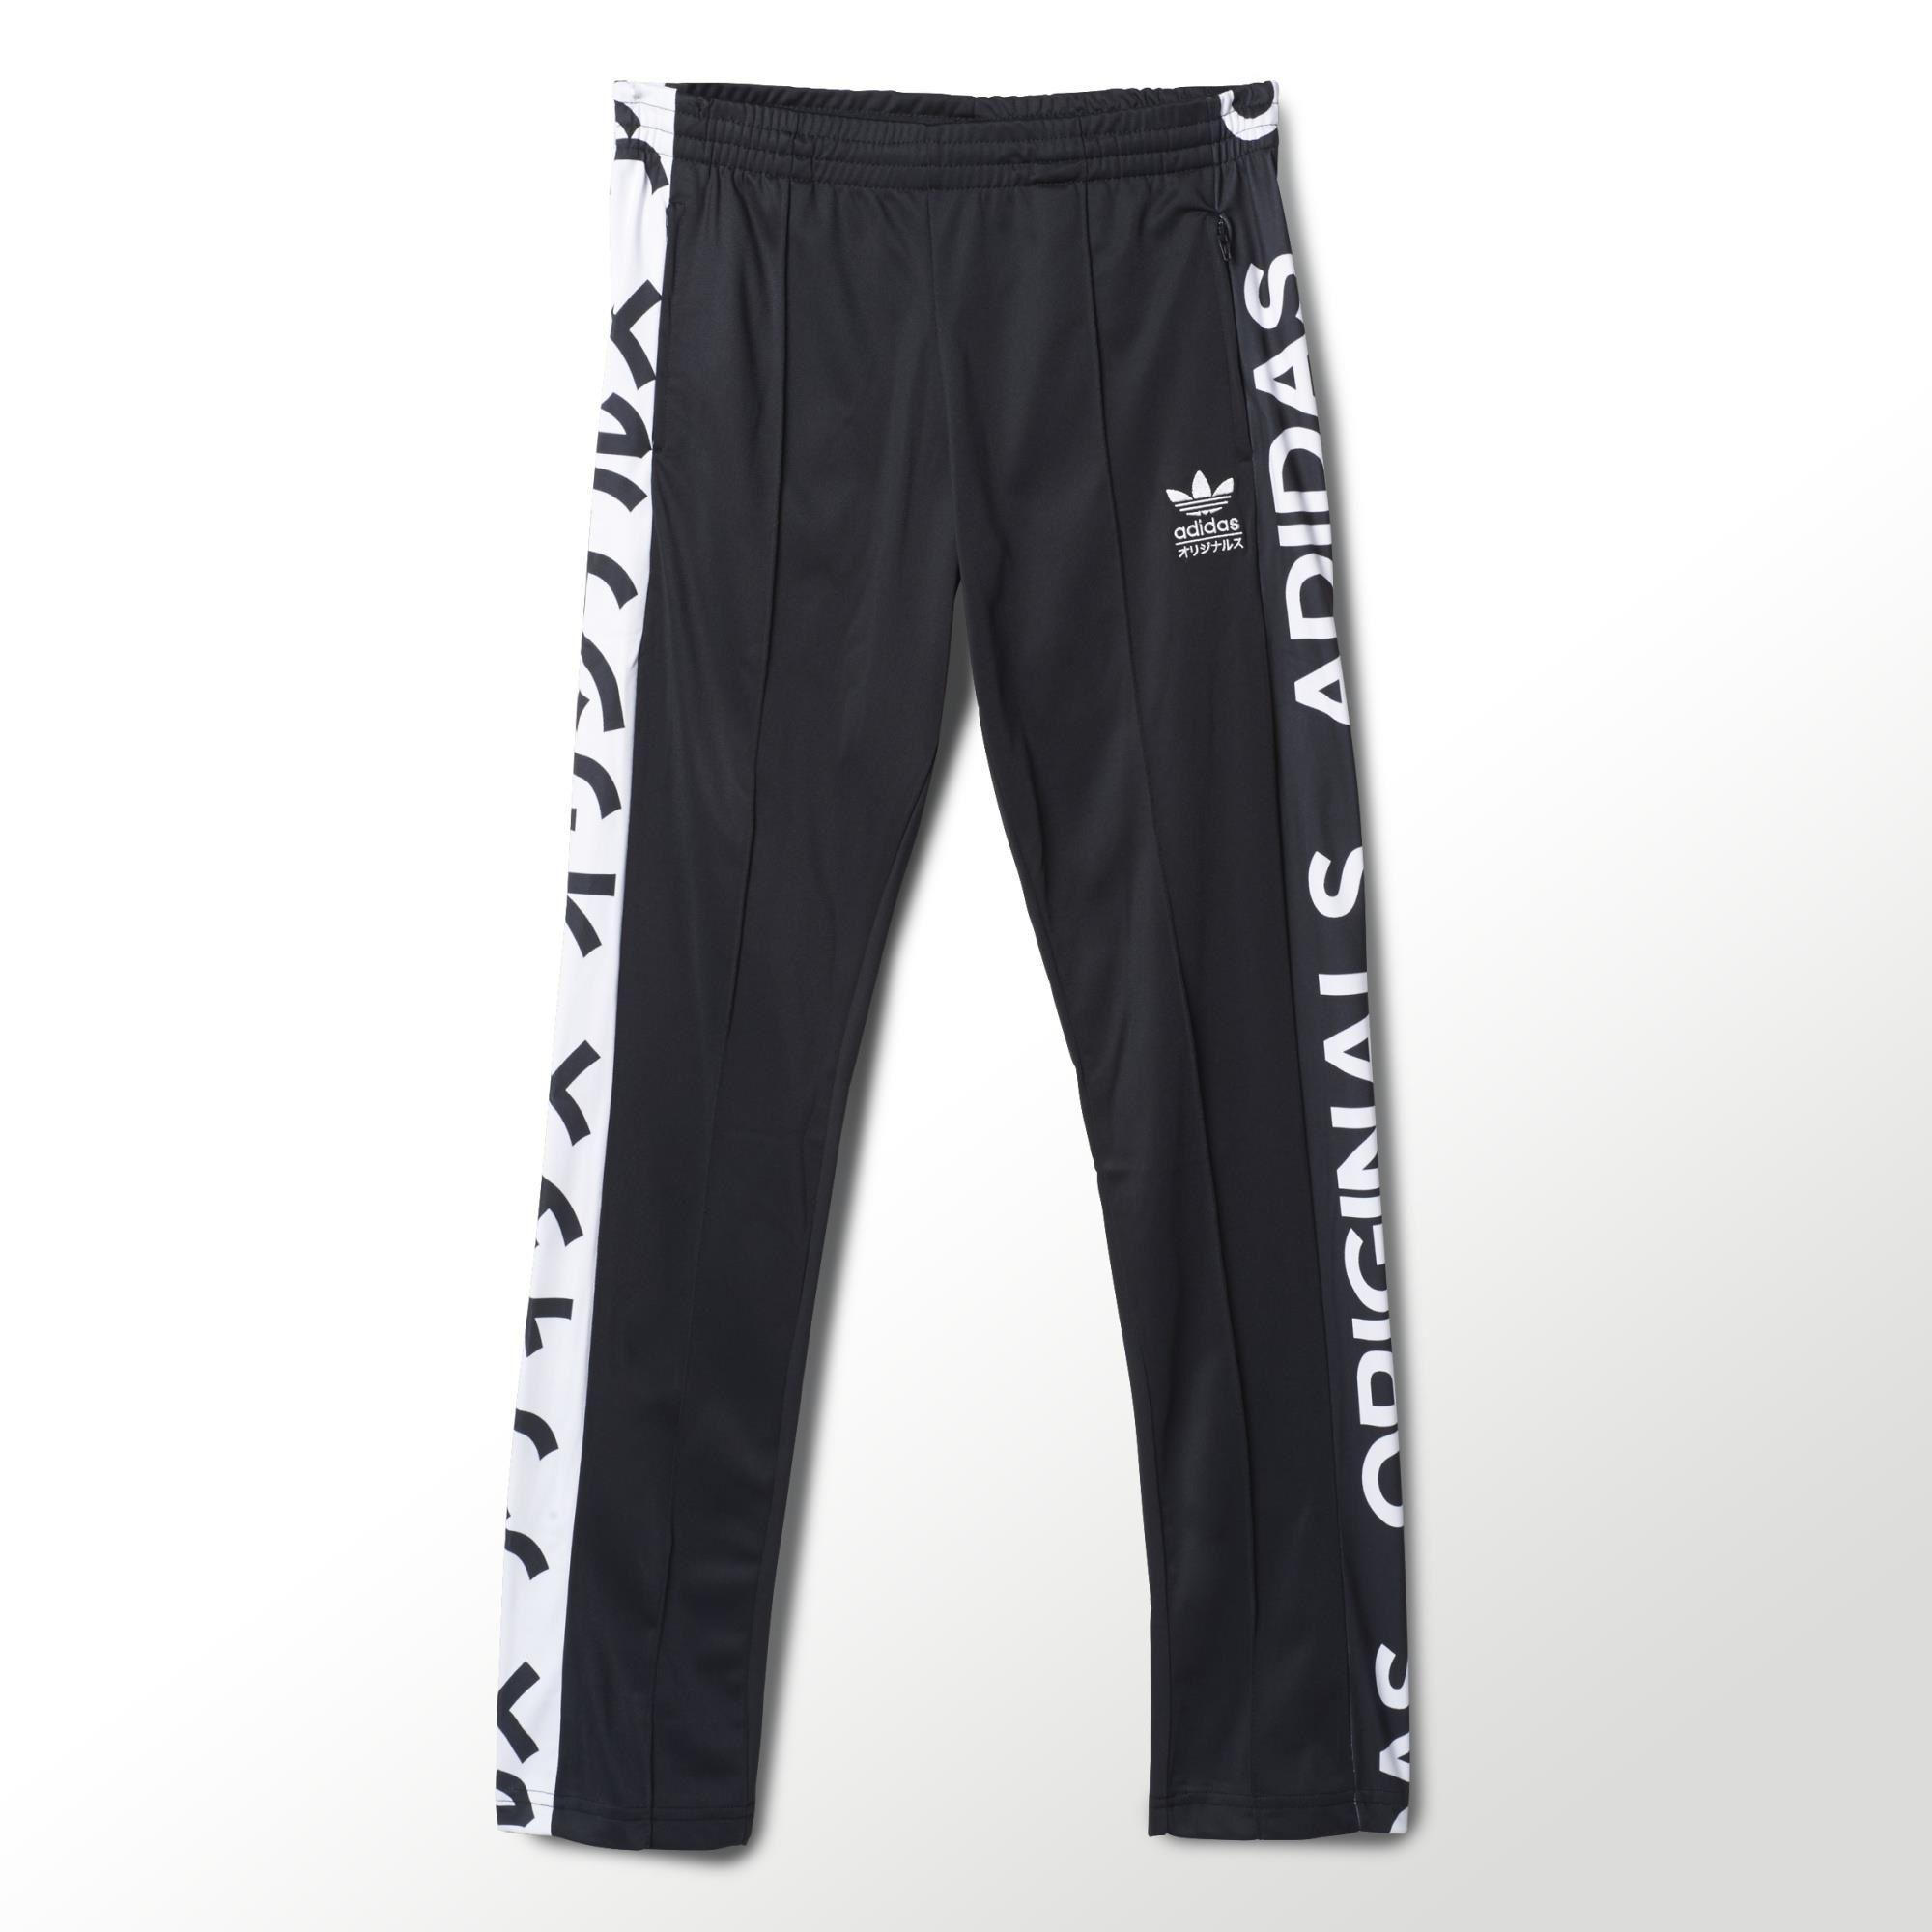 Adidas Typo Track Pants Pants Adidas Official Women [ 2000 x 2000 Pixel ]